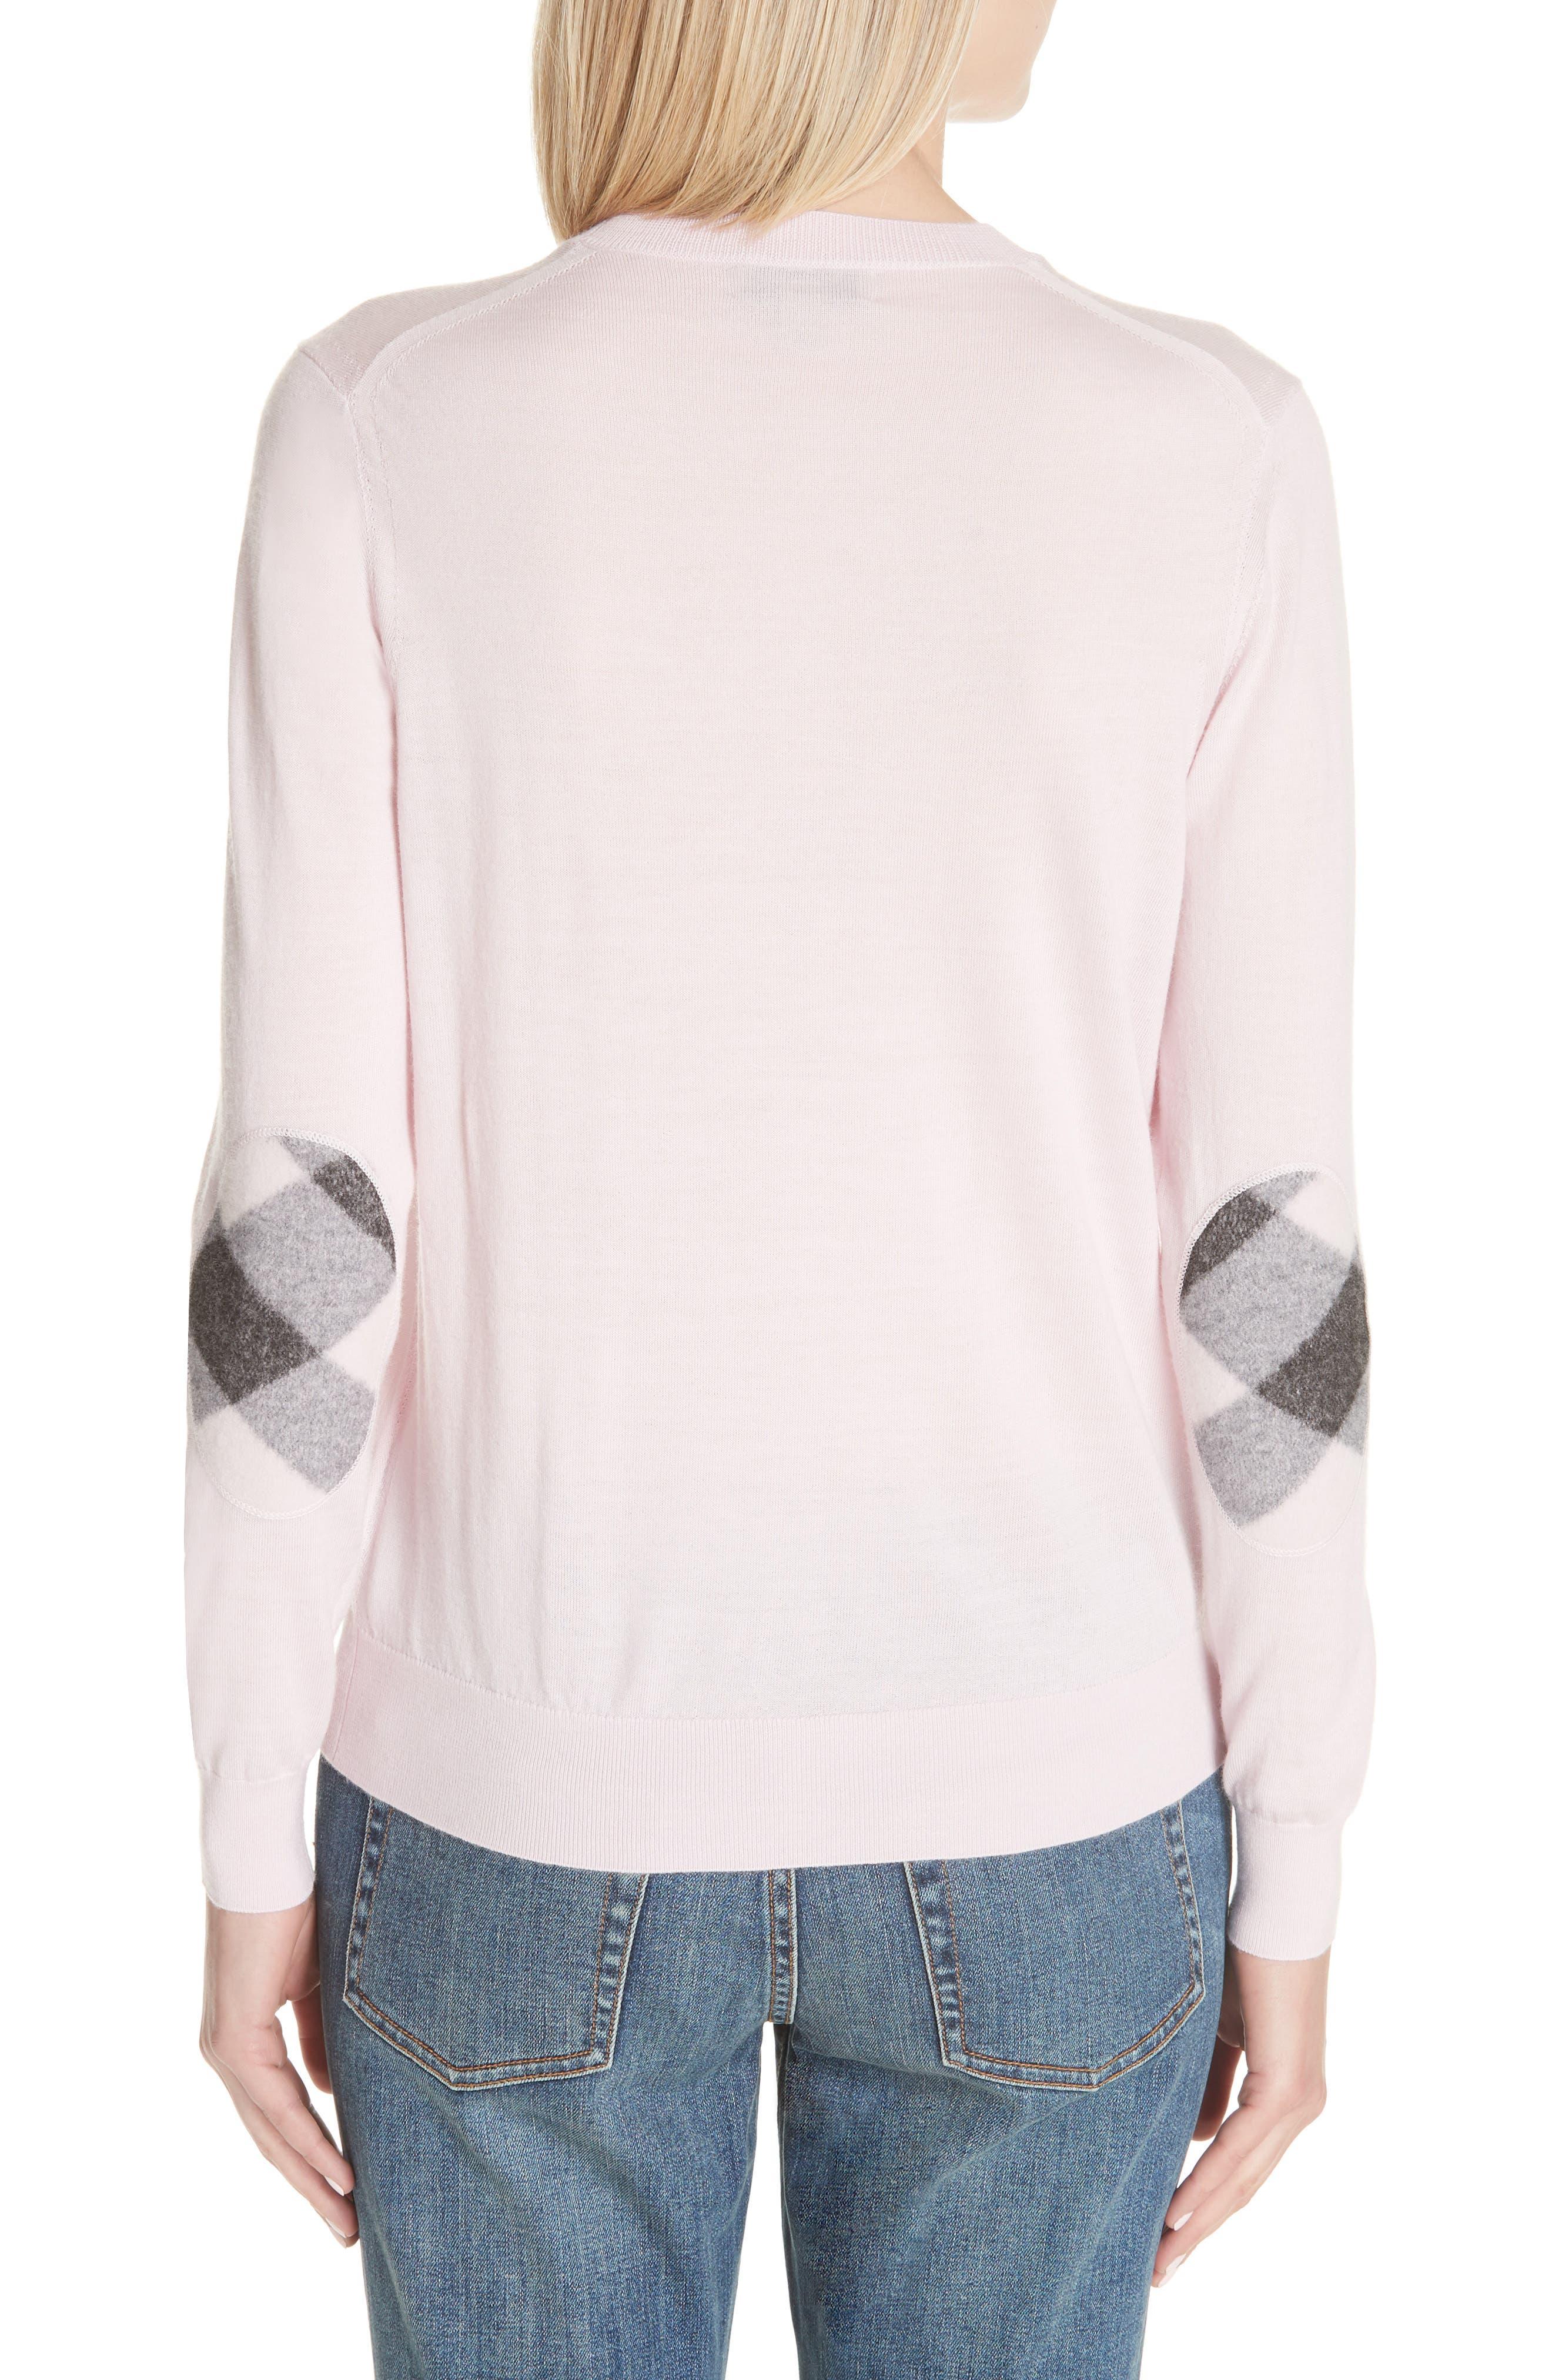 Viar Merino Wool Sweater,                             Alternate thumbnail 12, color,